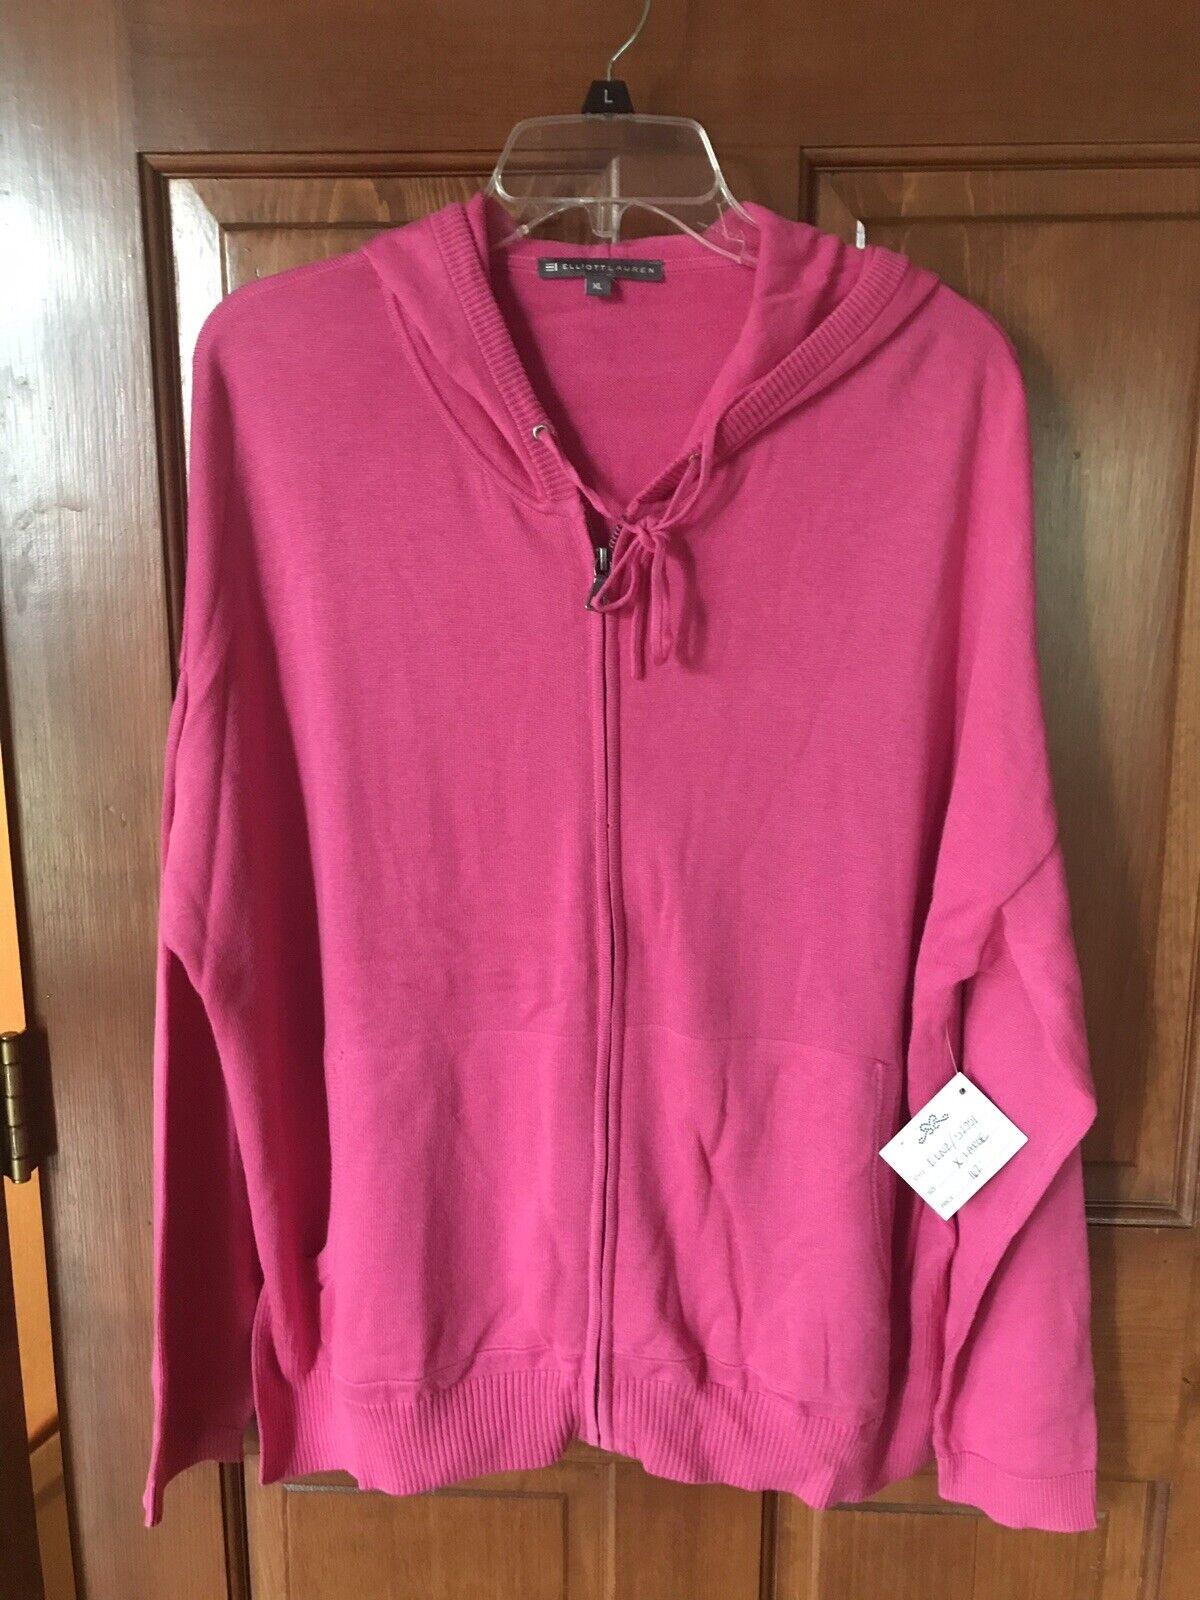 Elliot Lauren Cotton Blend Hooded Zip Up Sweater XL 162 162 162 Bright Pink 422338